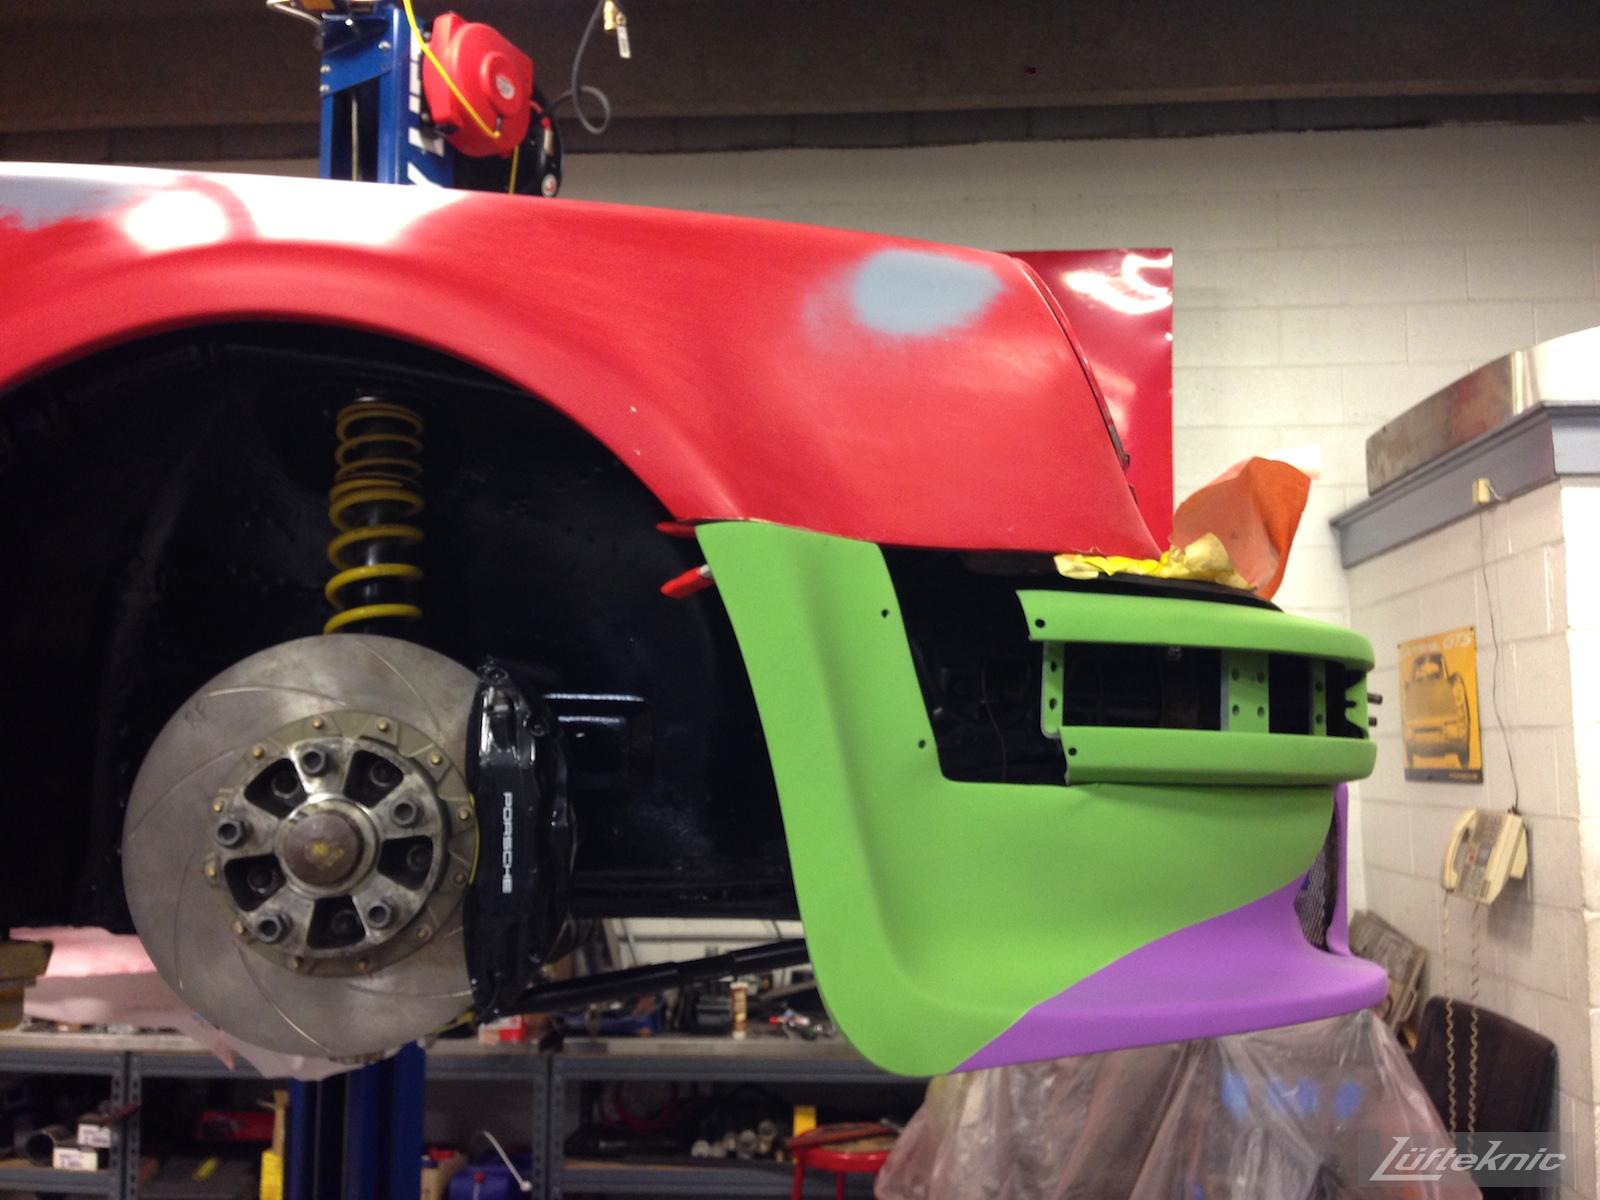 Lüfteknic #projectstuka Porsche 930 Turbo bumper trial fitment